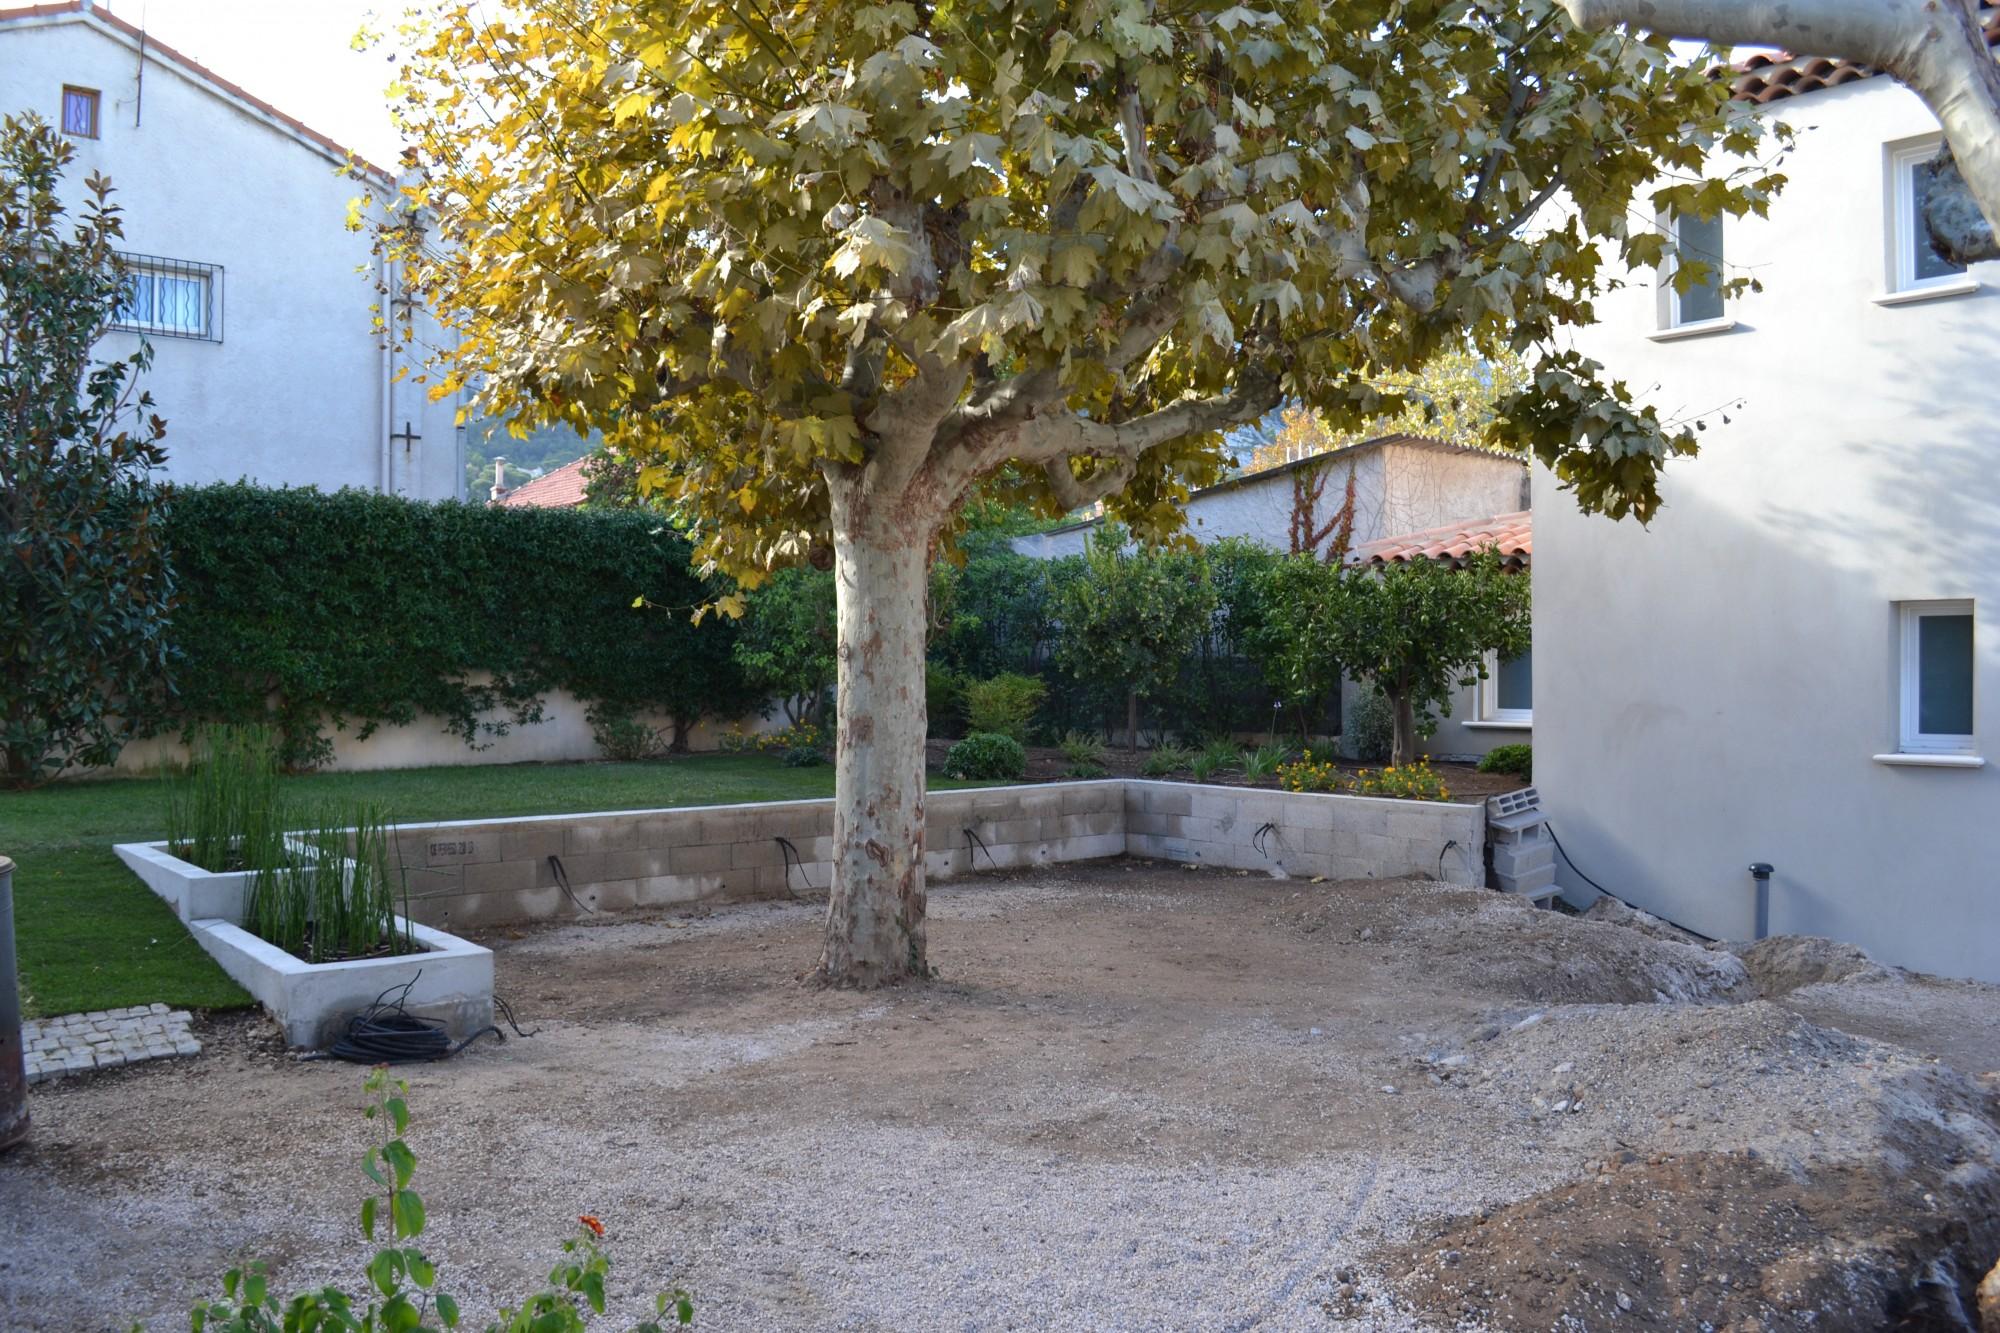 cr ation de jardini res b ties dans un jardin priv vert tige. Black Bedroom Furniture Sets. Home Design Ideas